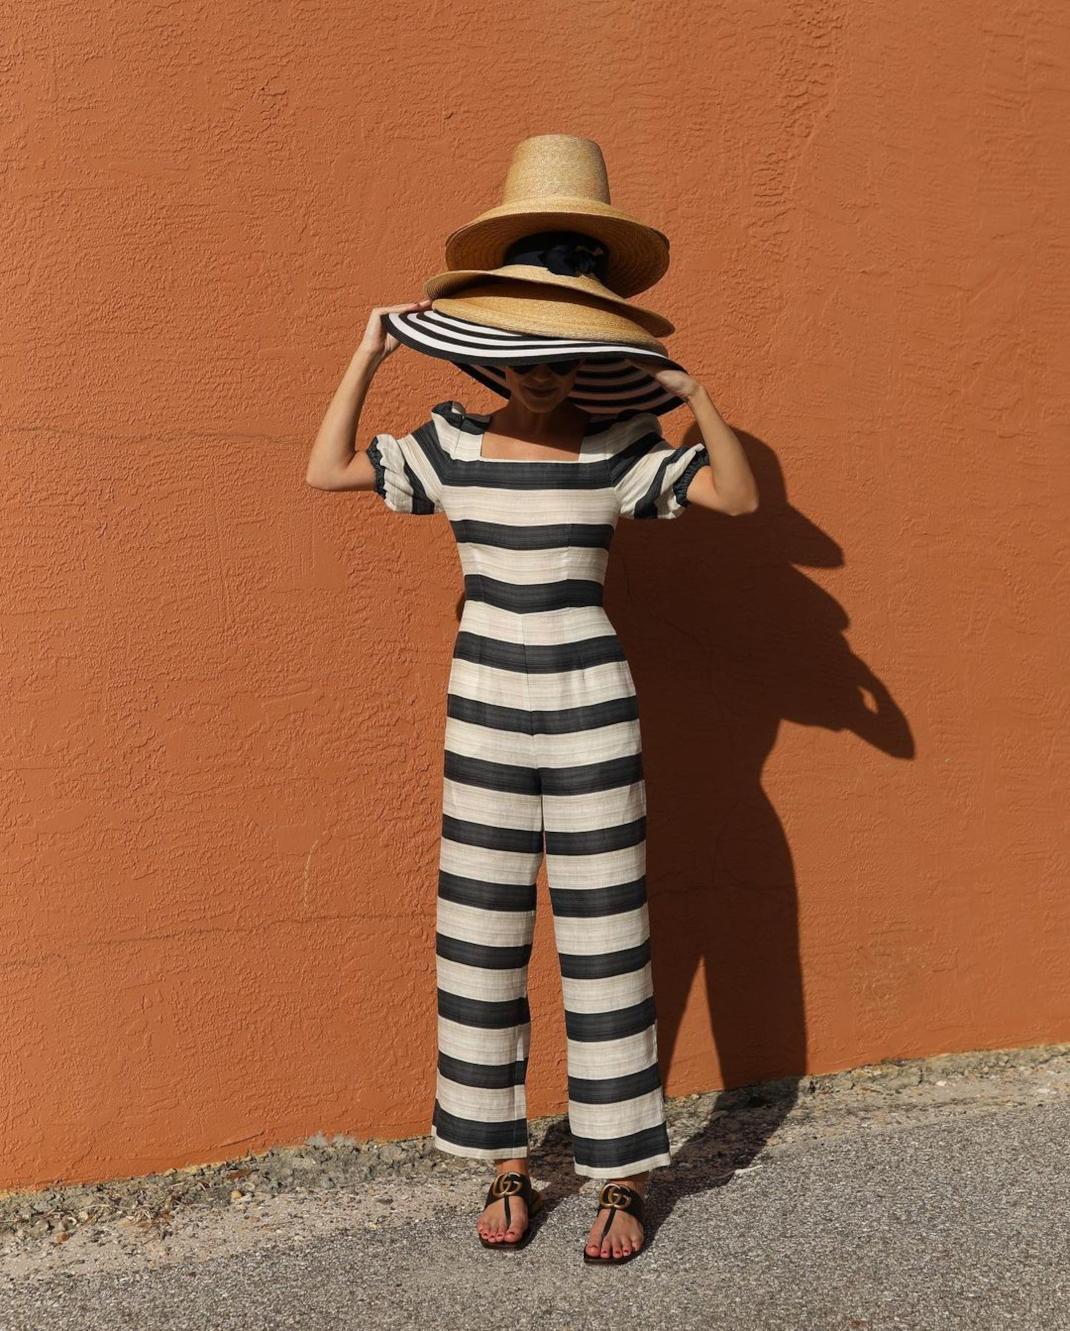 blaireadiebee ολόσωμη φόρμα ψάθινο καπέλο